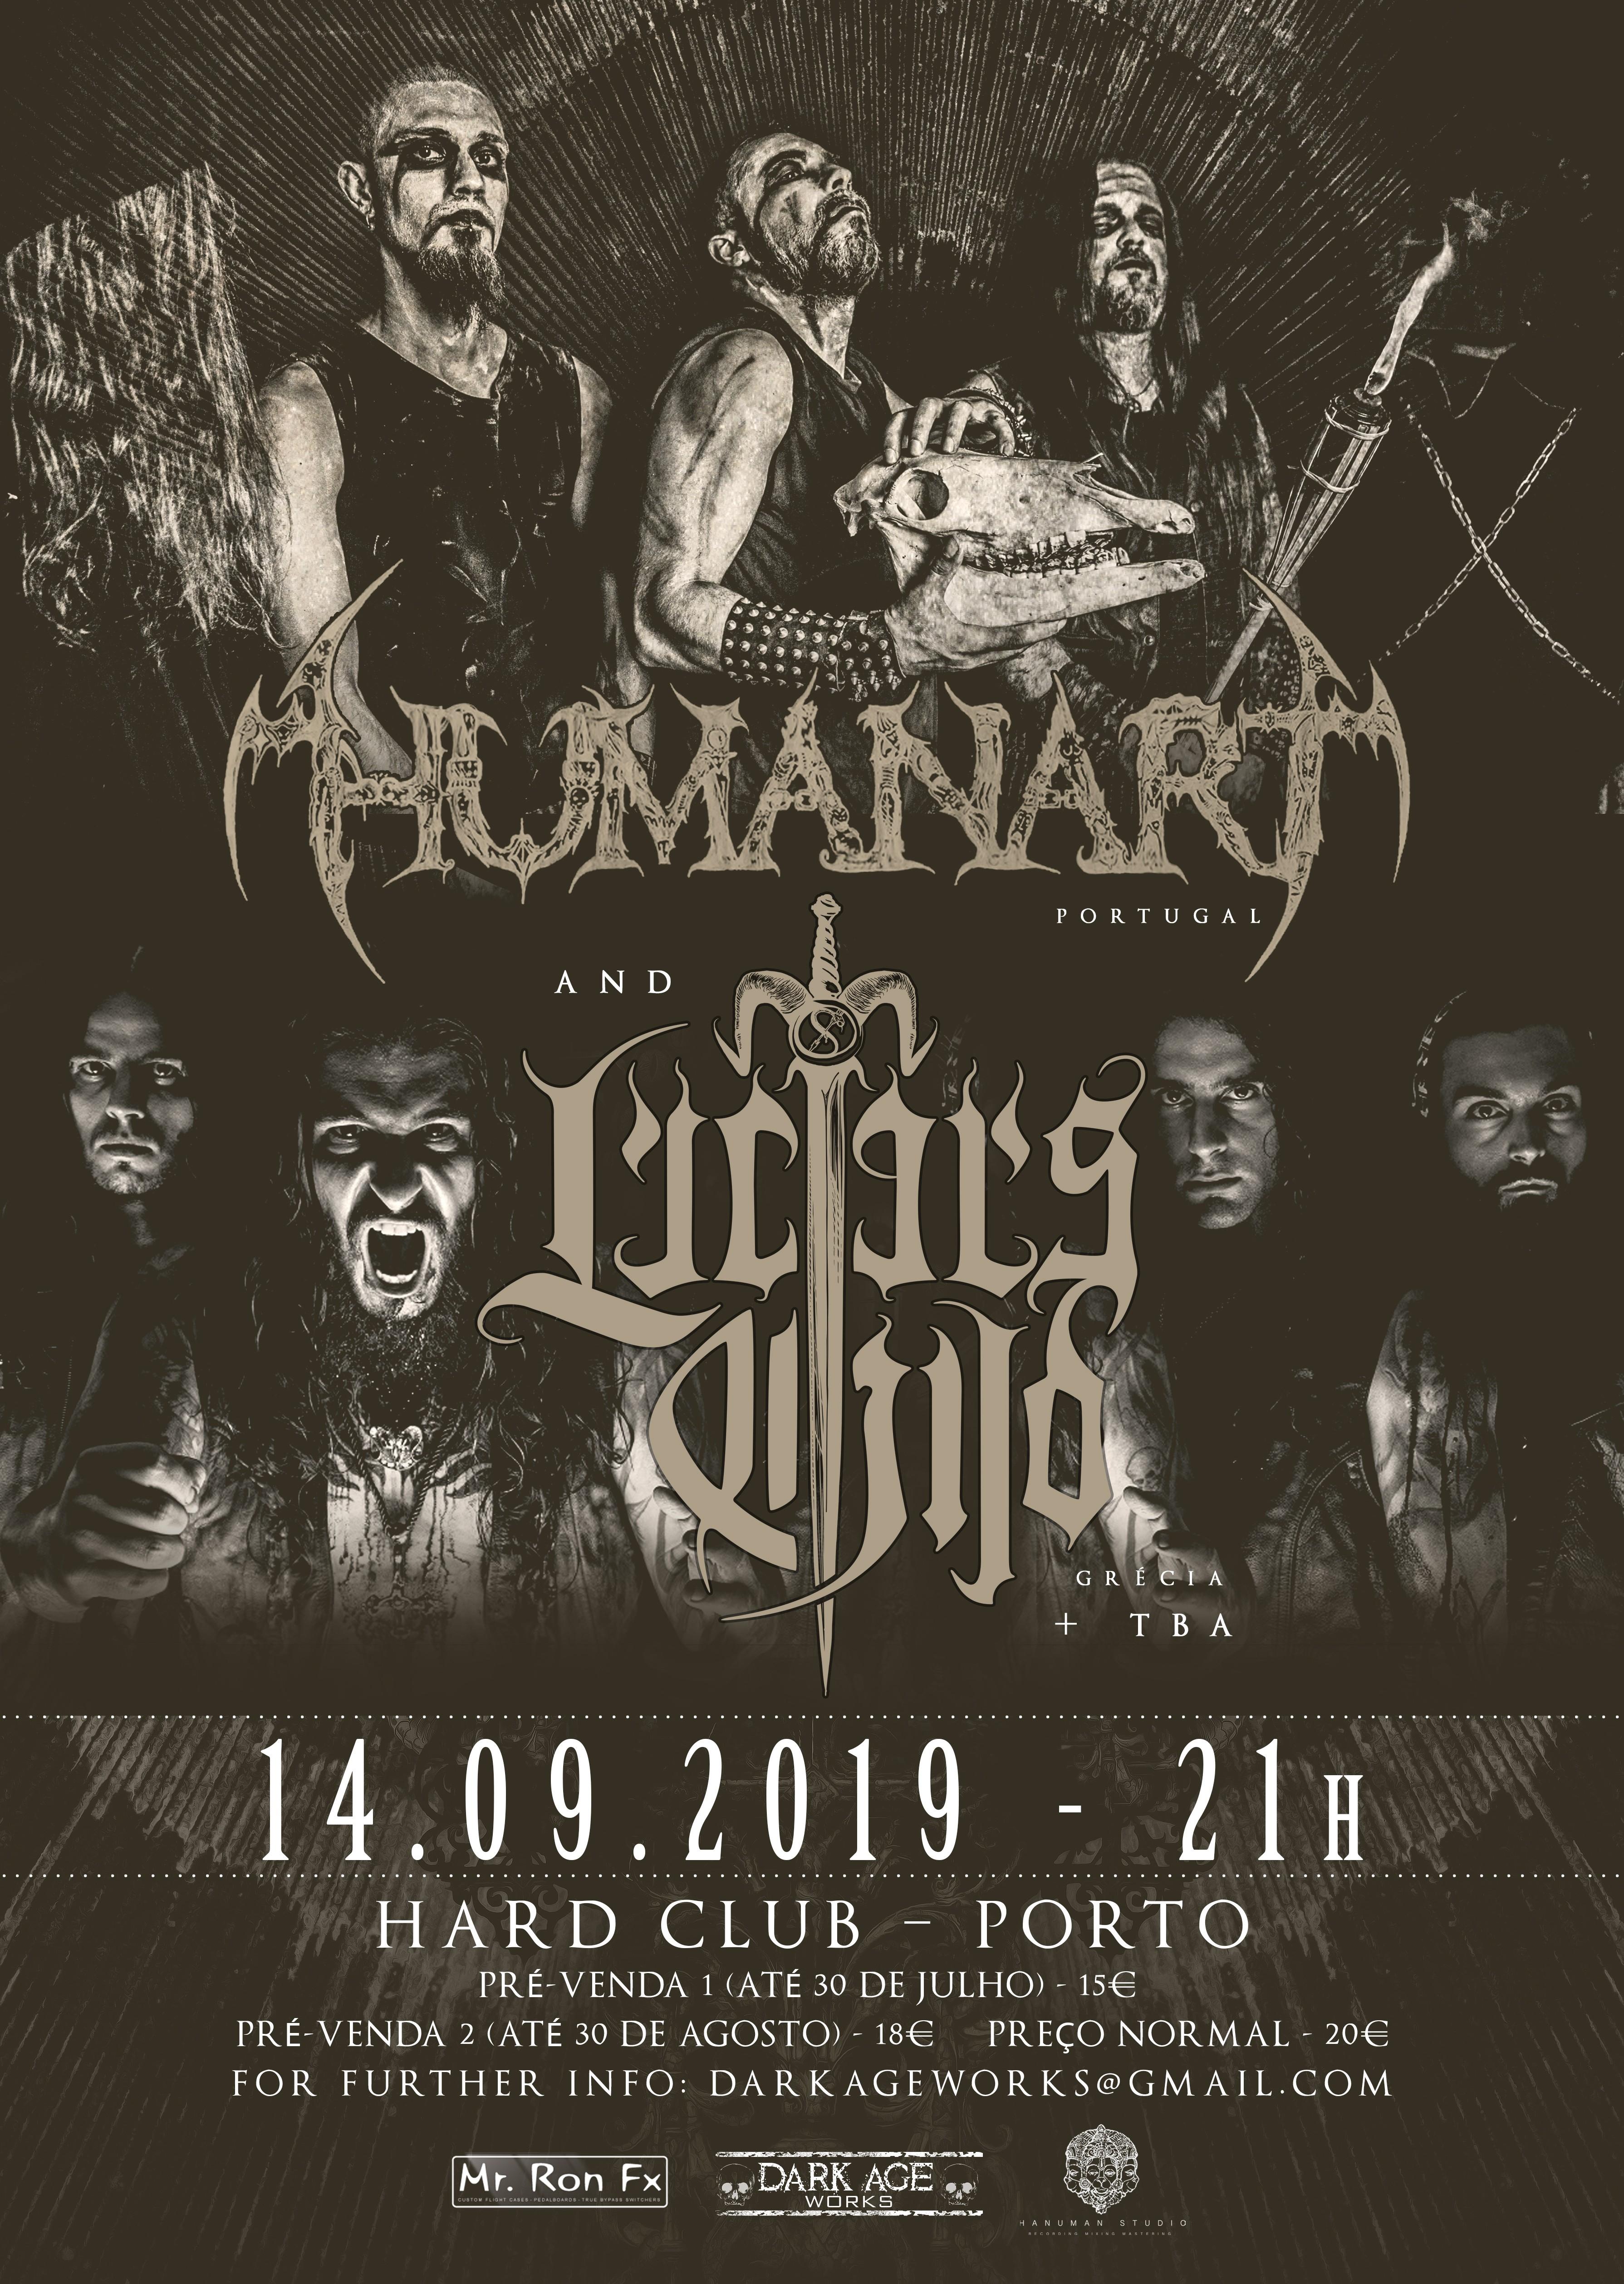 HUMANART (Blackmetal) - est.1998 - Página 4 RnH23K